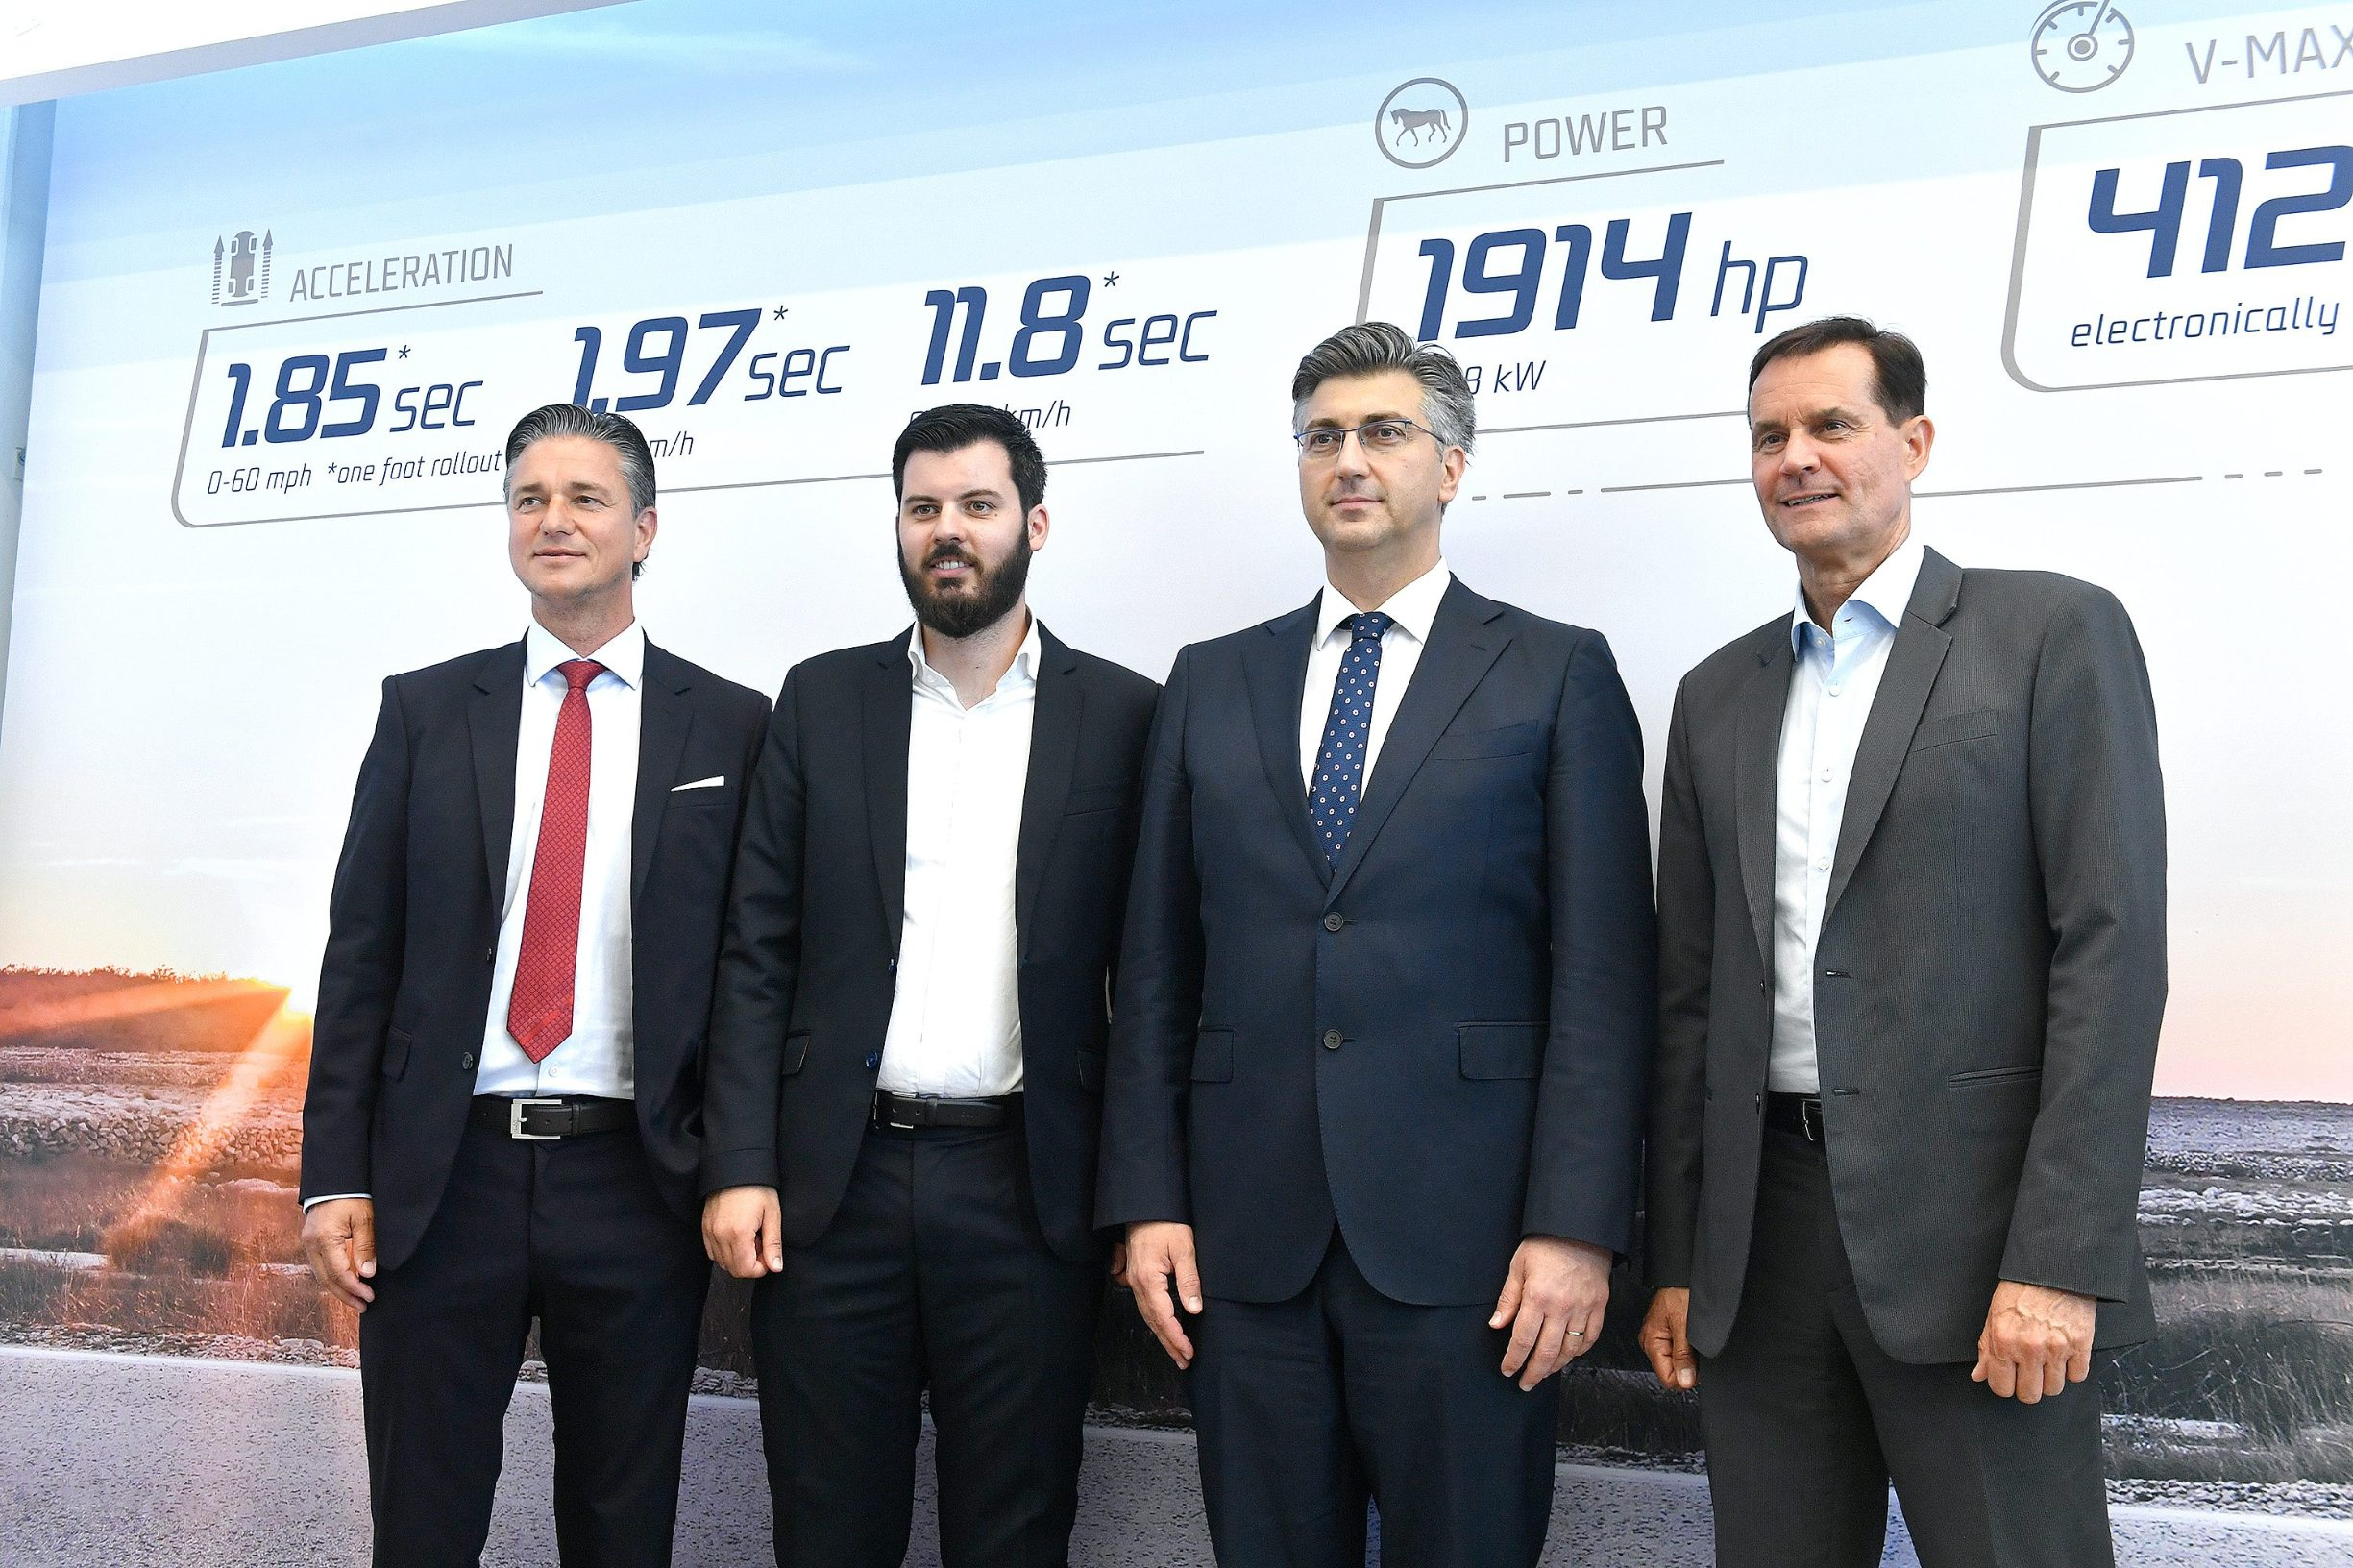 Lutz Meschke, Mate Rimac, Andrej Plenković, Thomas Schemera